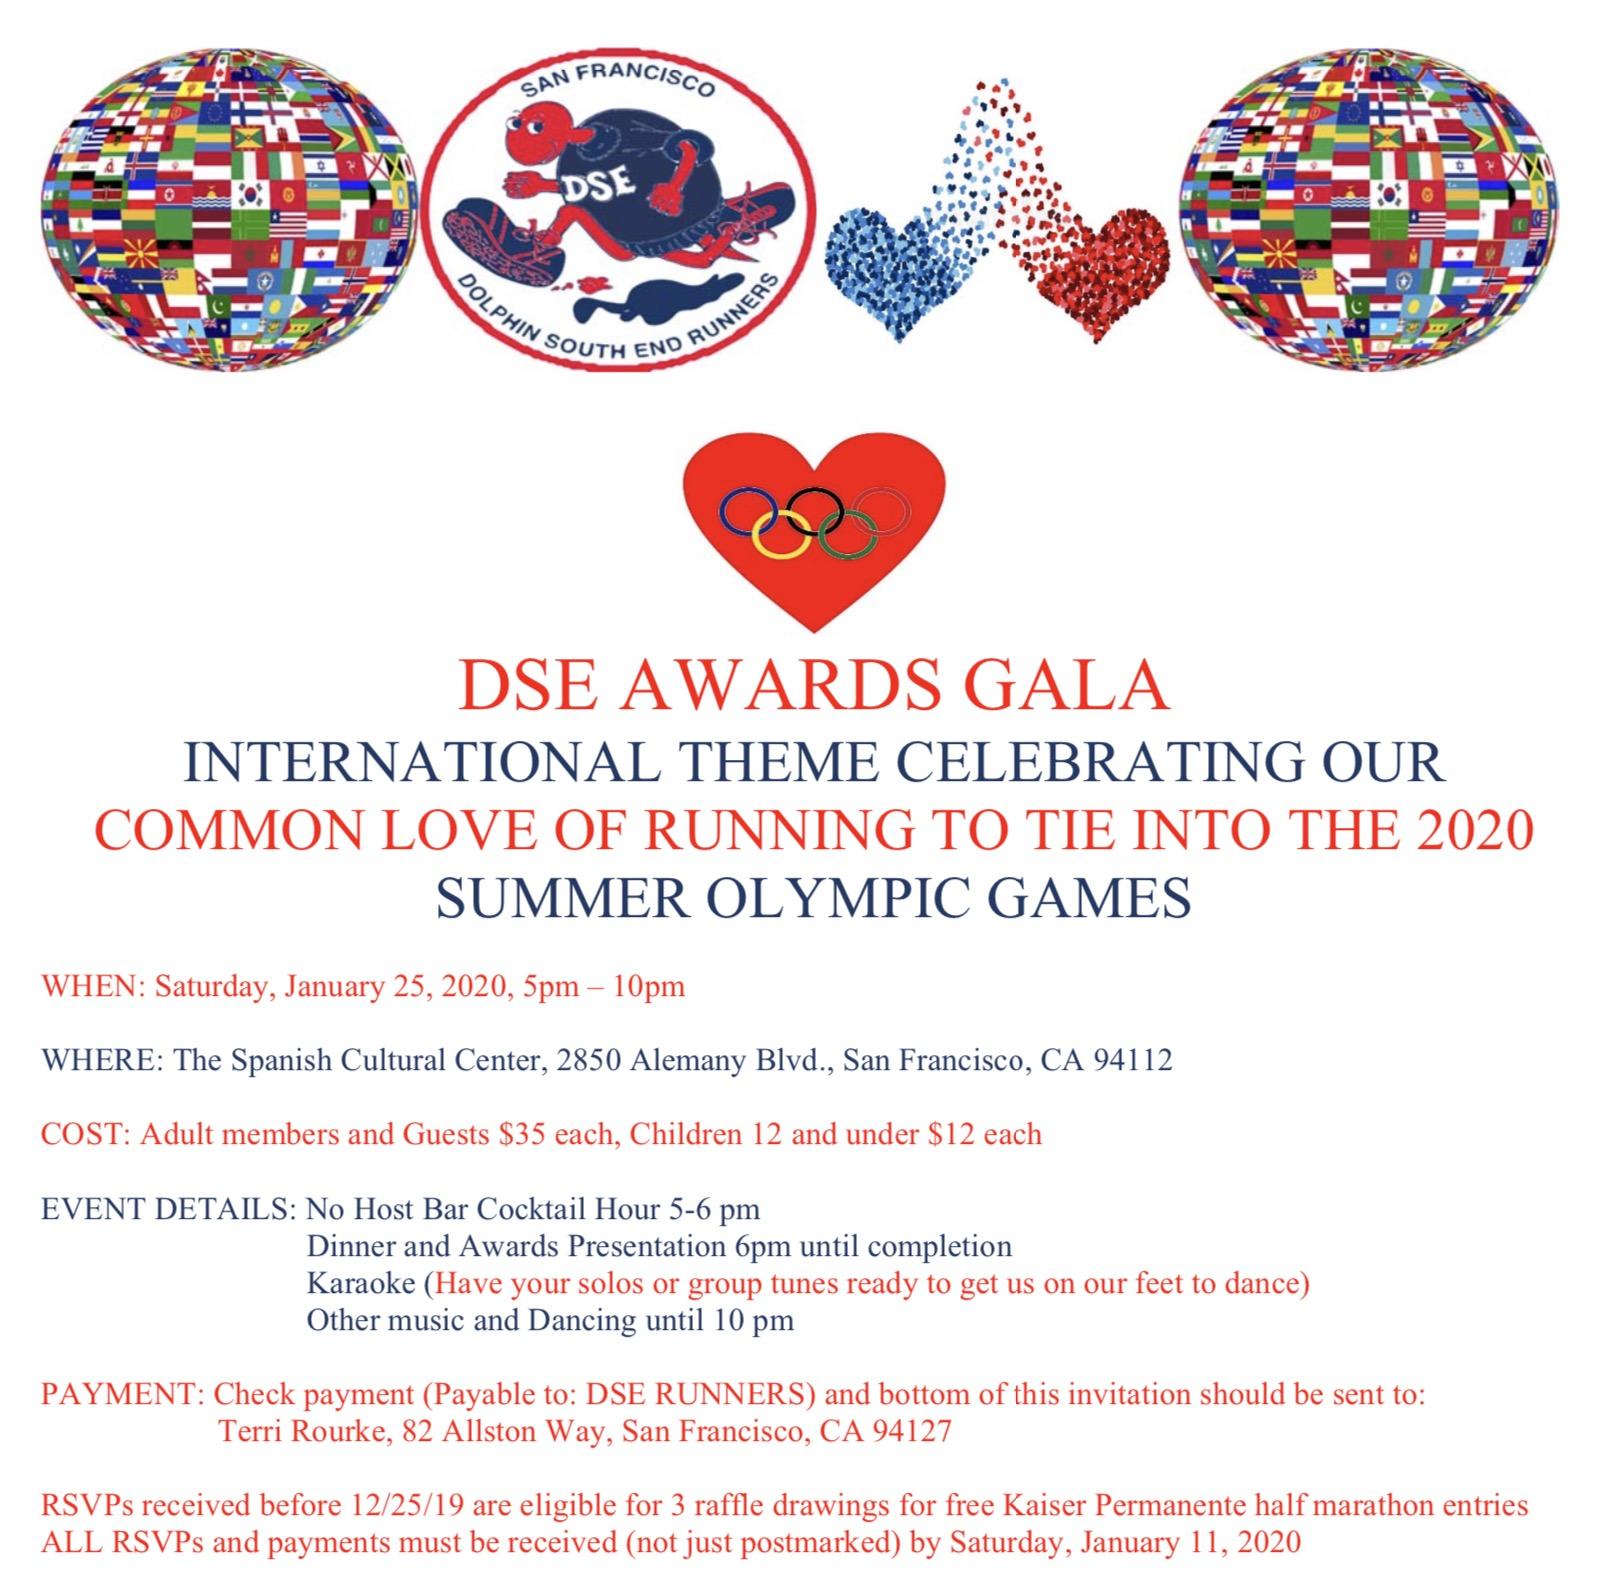 DSE Gala Invitation 2020